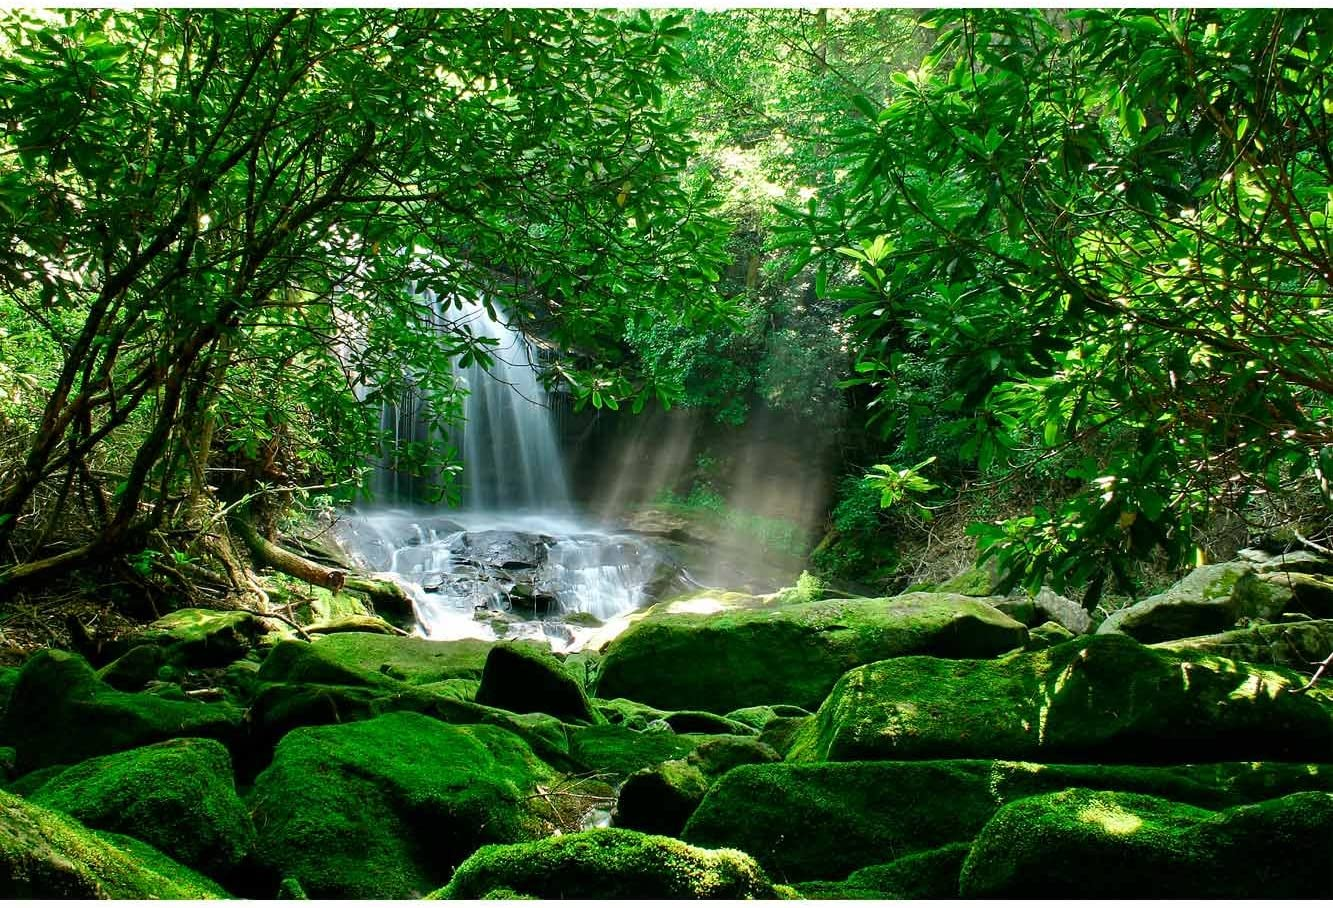 Papel Pintado Pared Cascada Bosque Tropical Mural Habitaciones. Papel Pintado Fotomural para Paredes Decoraci/ón comedores Varias Medidas 100 x 70 cm Salones